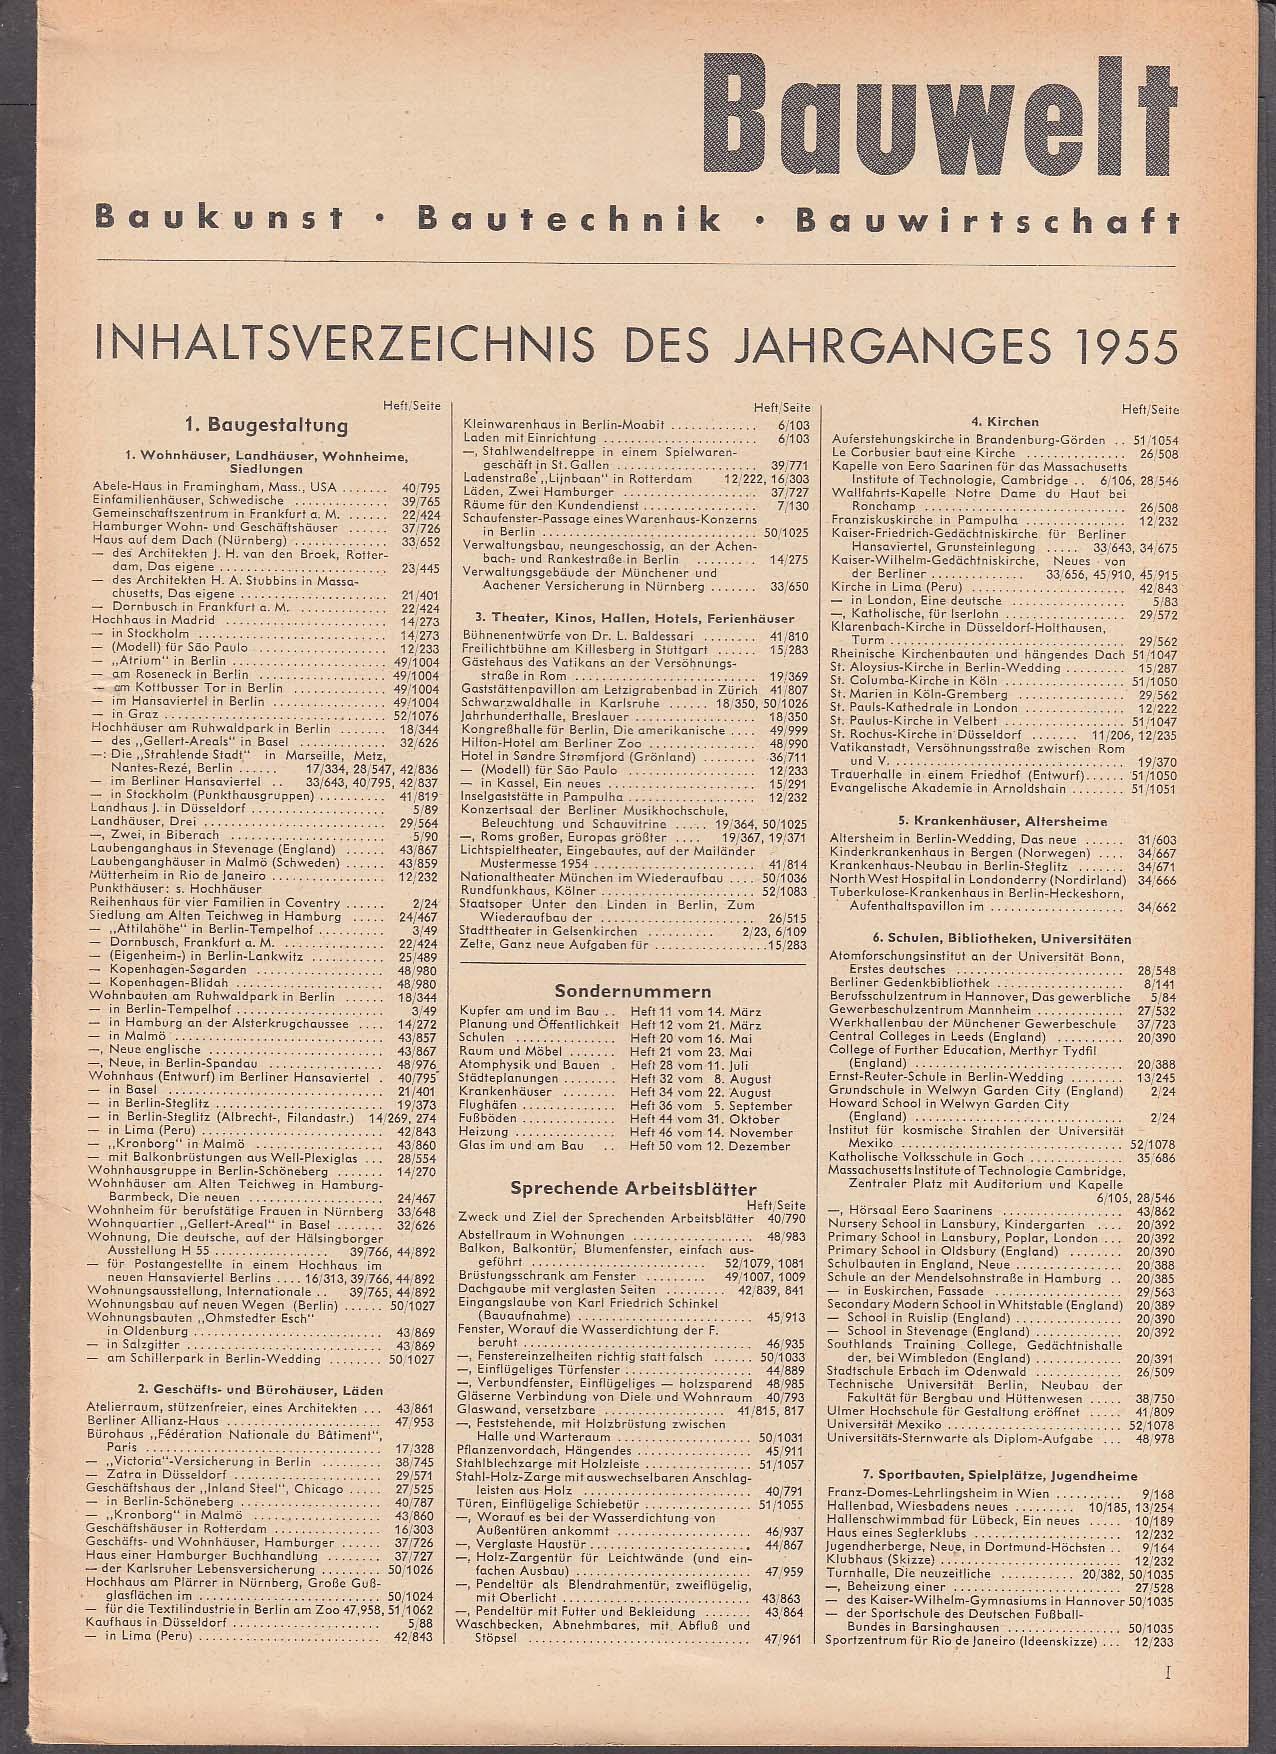 Bauwelt German architecture magazine 1955 index